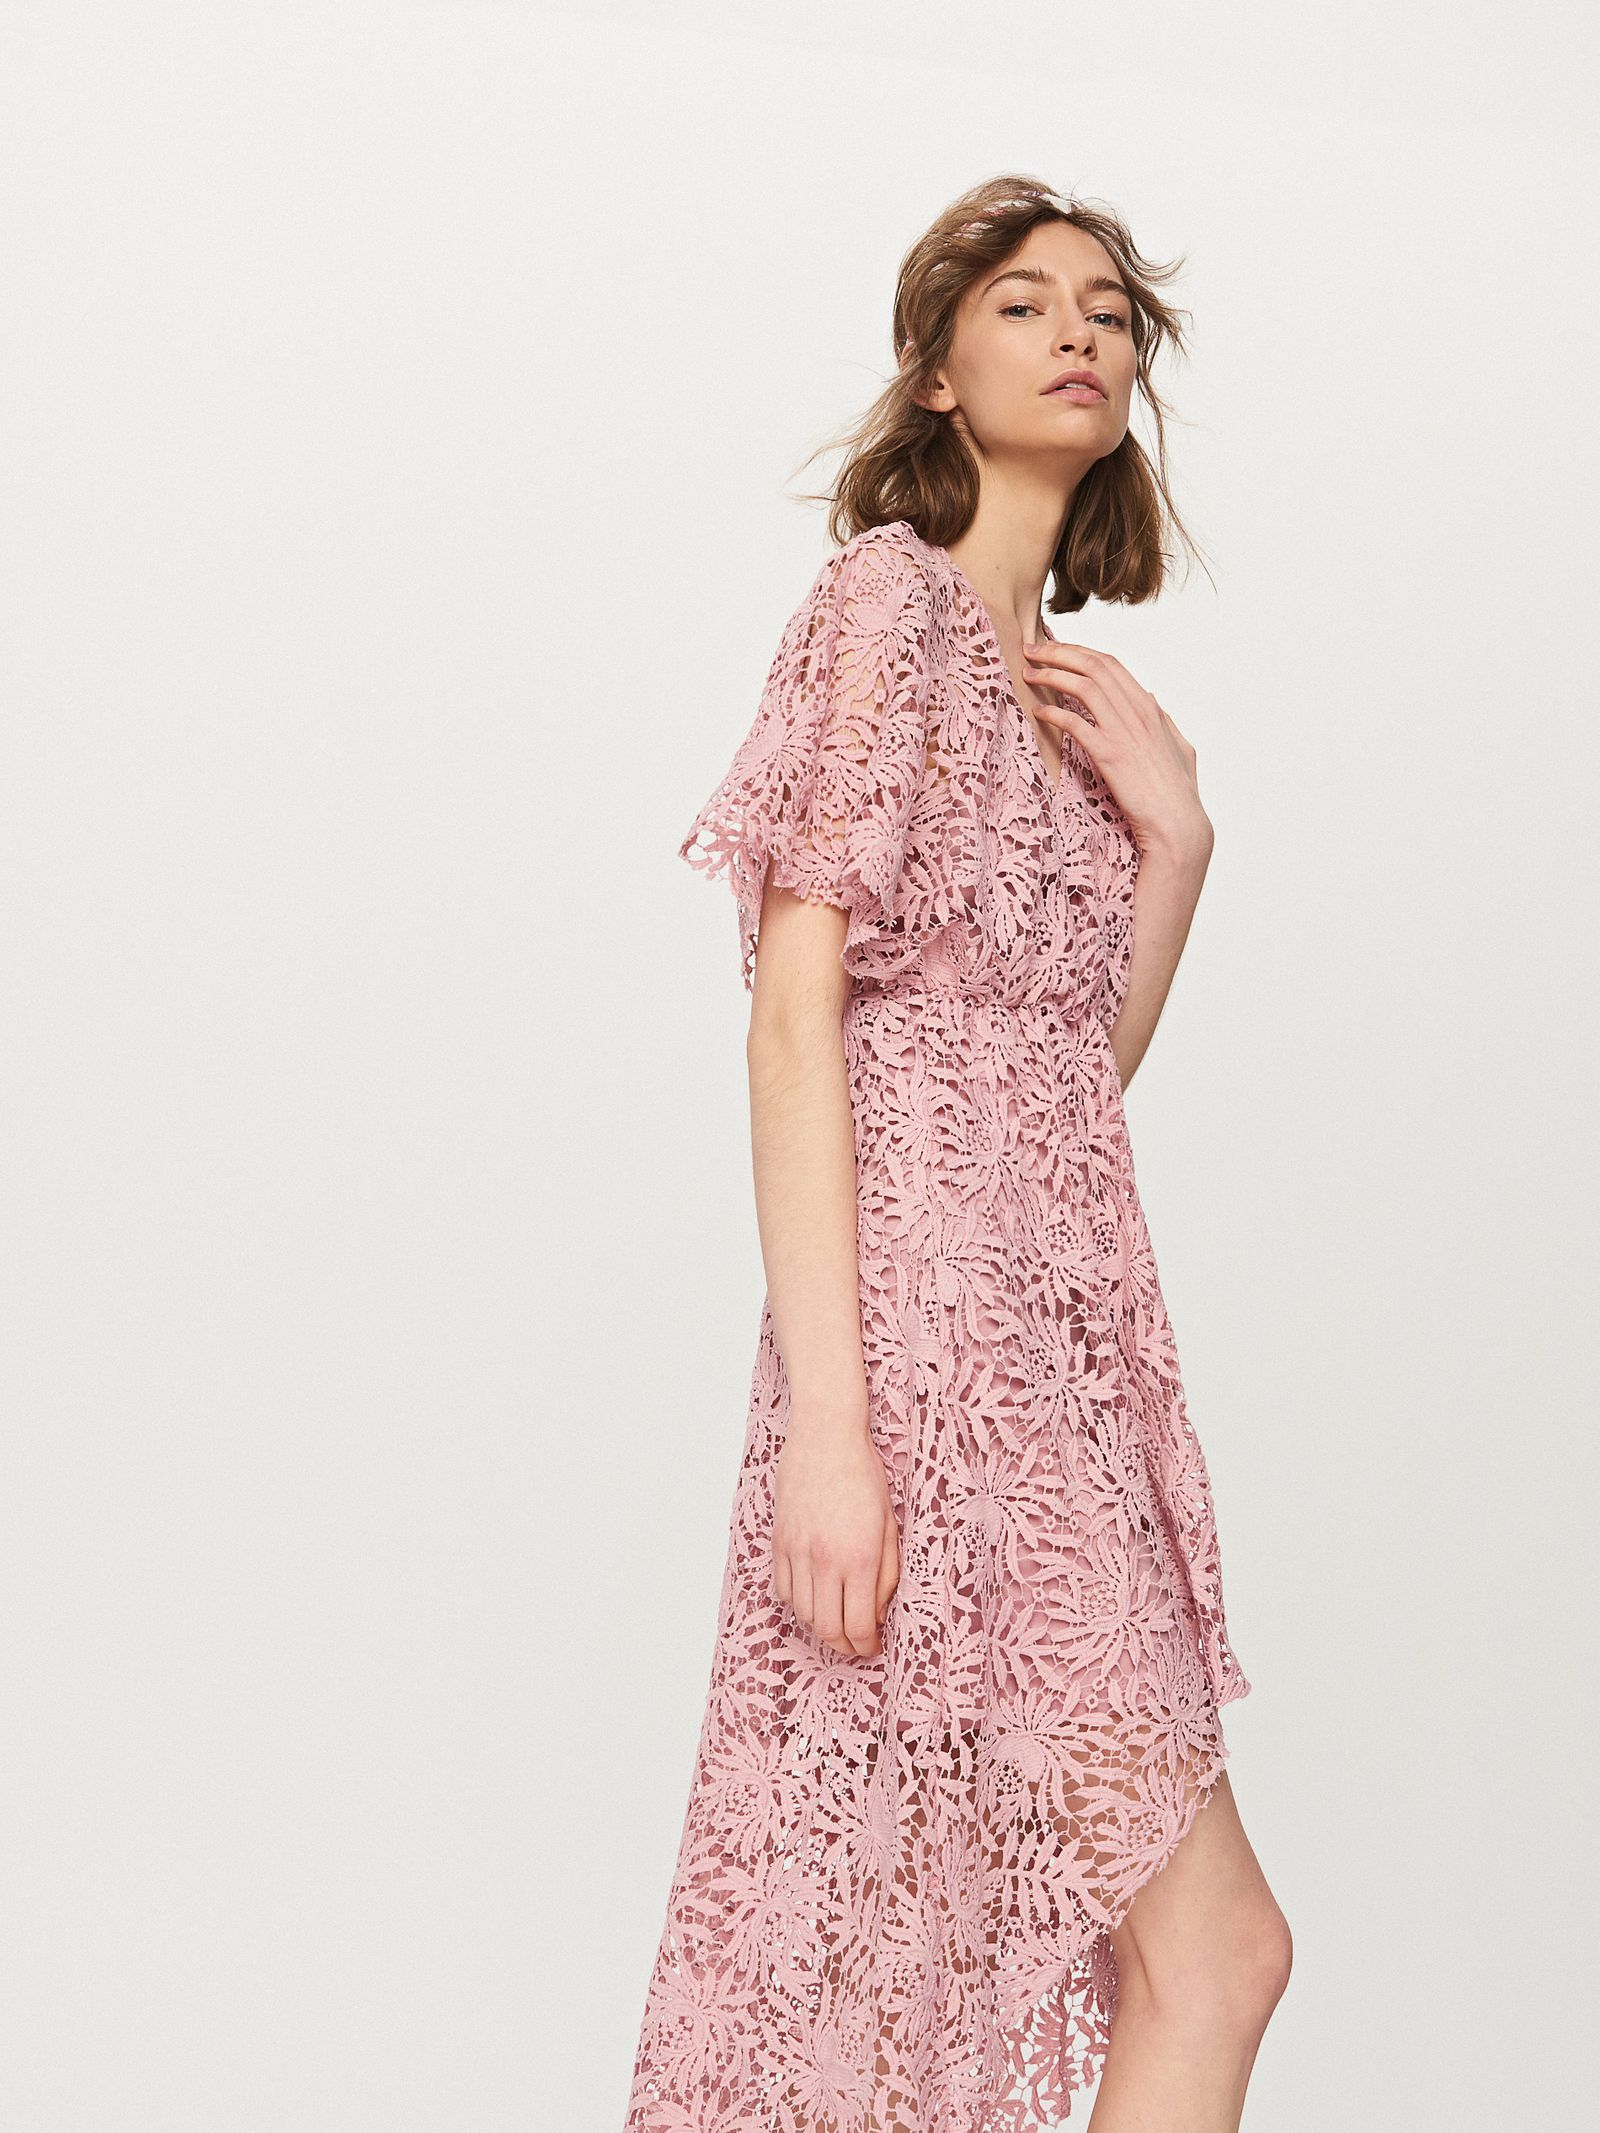 7493ed3e6f57 Wedding guest dresses under £100 - CosmopolitanUK